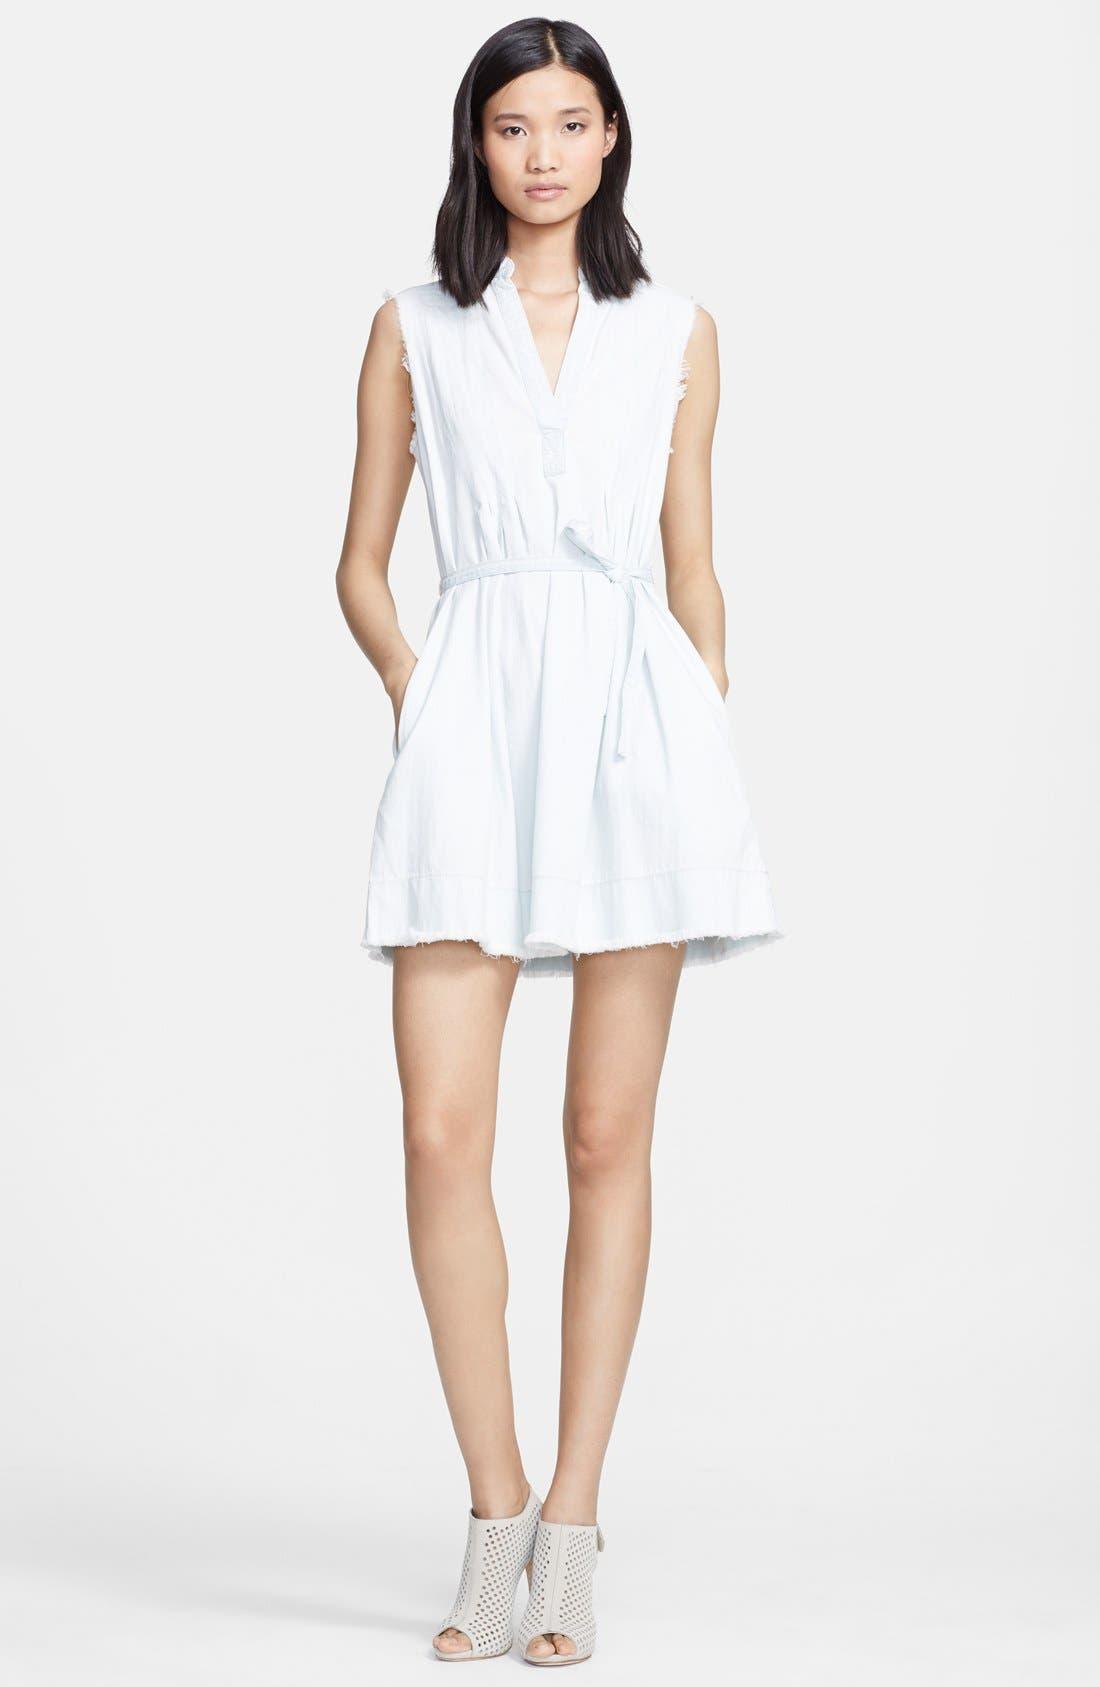 Main Image - Current/Elliott 'The Craftsman Smock' Cotton Dress